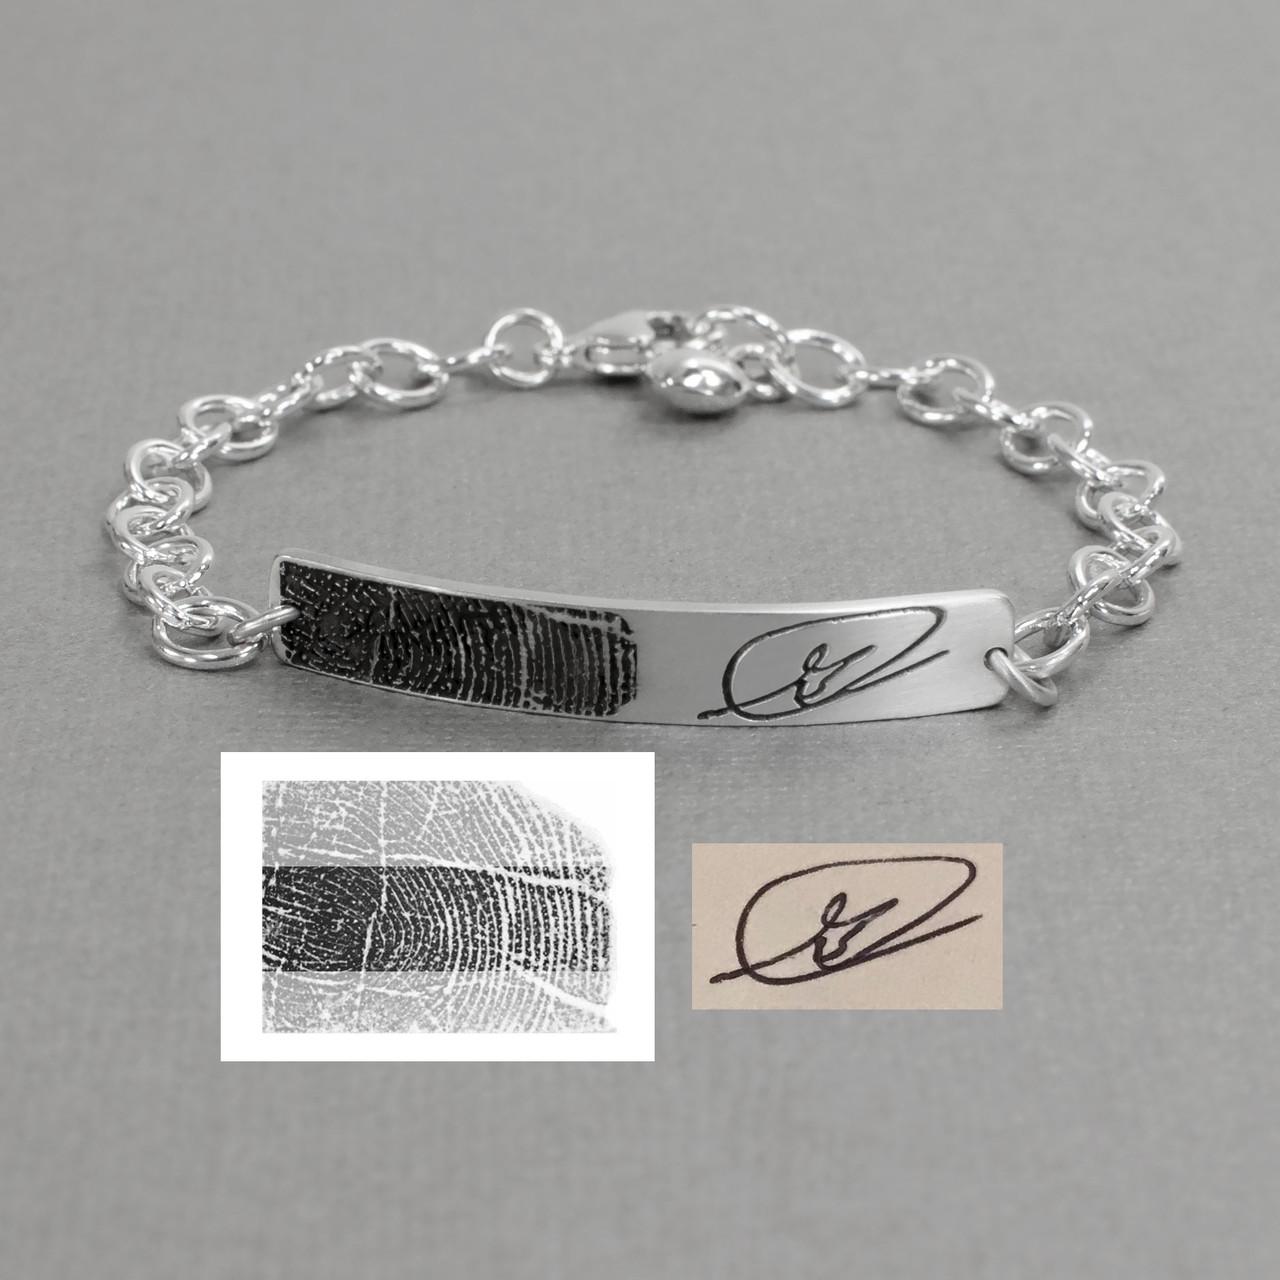 Custom Silver Fingerprint and handwriting ID Bracelet, shown on gray with original handwriting and fingerprint